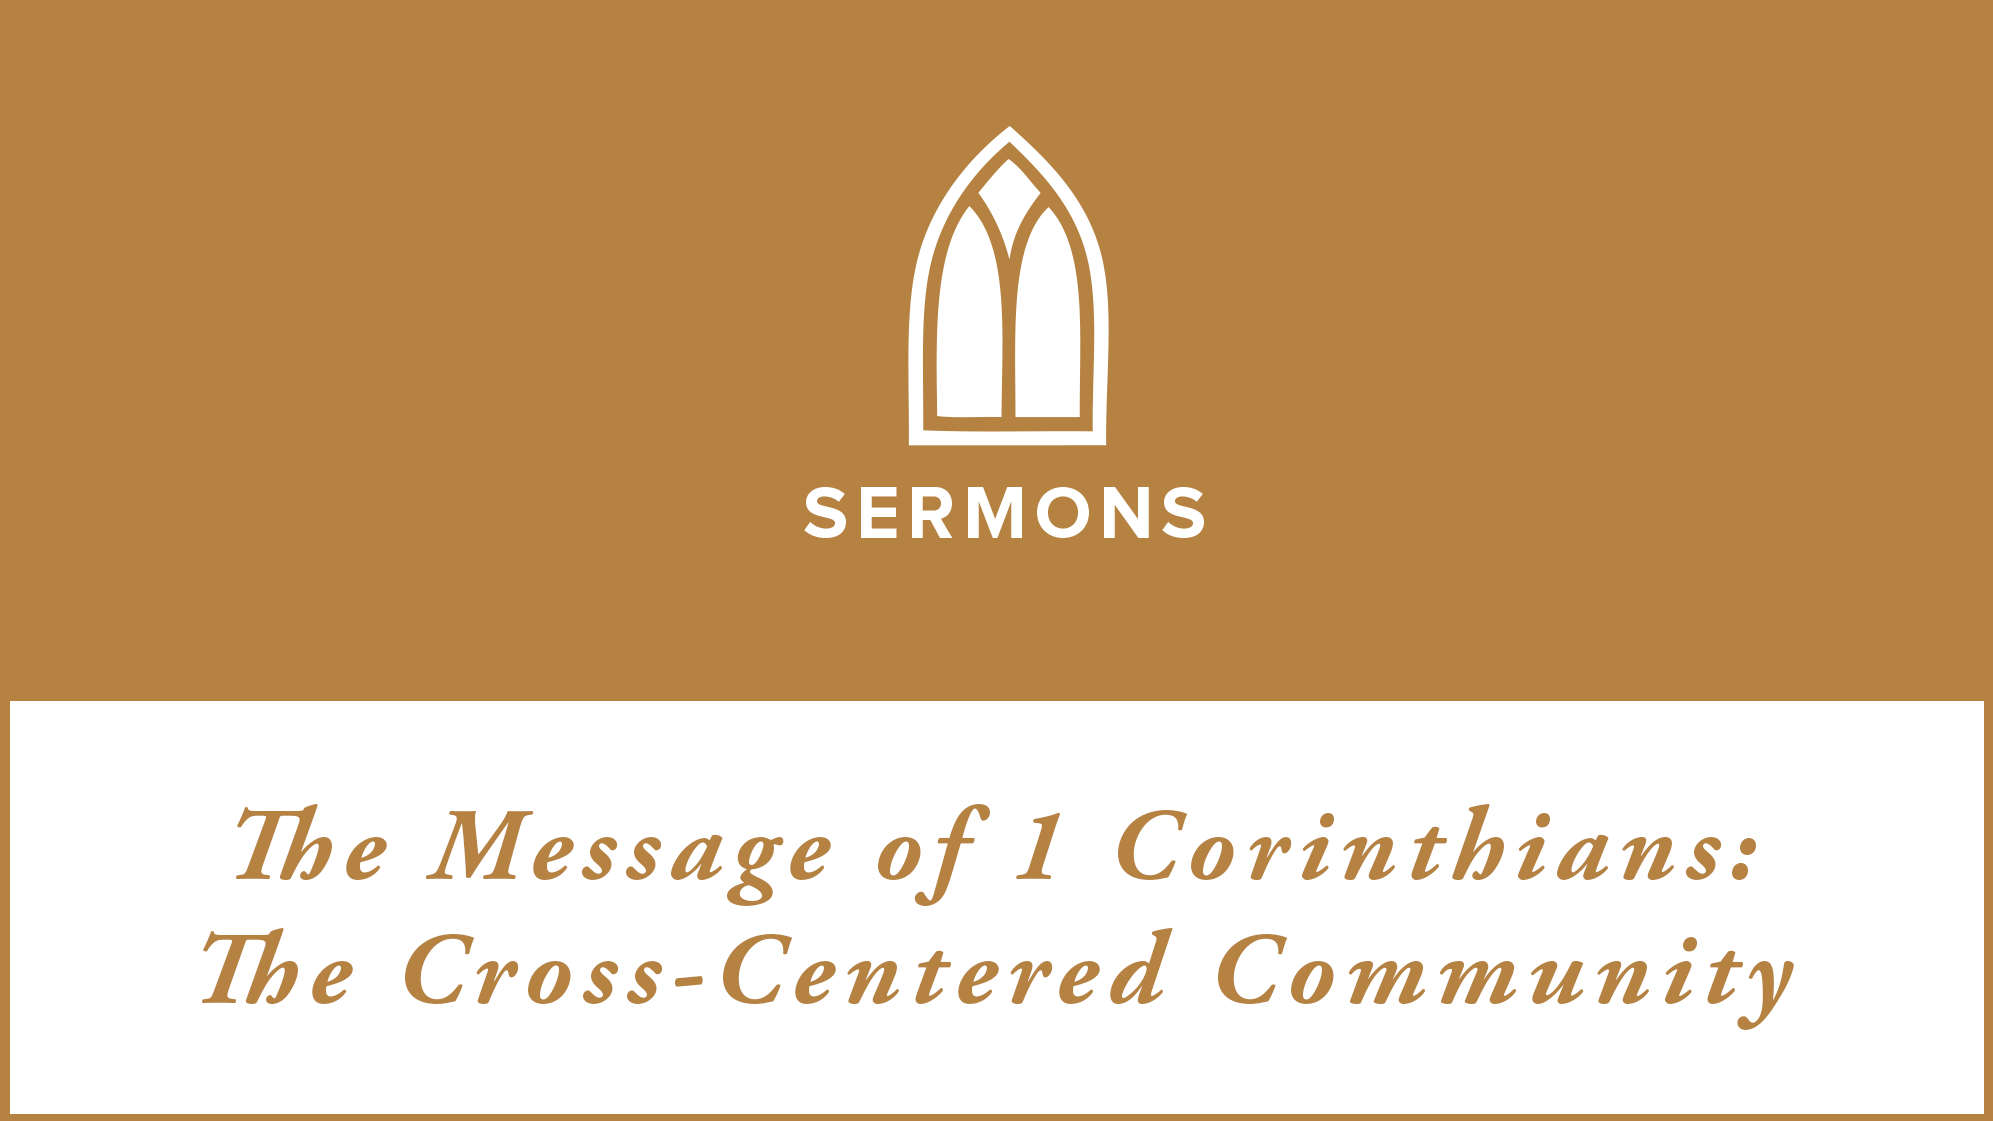 1Corinthians-Cross-Centered-Community-16x9.png